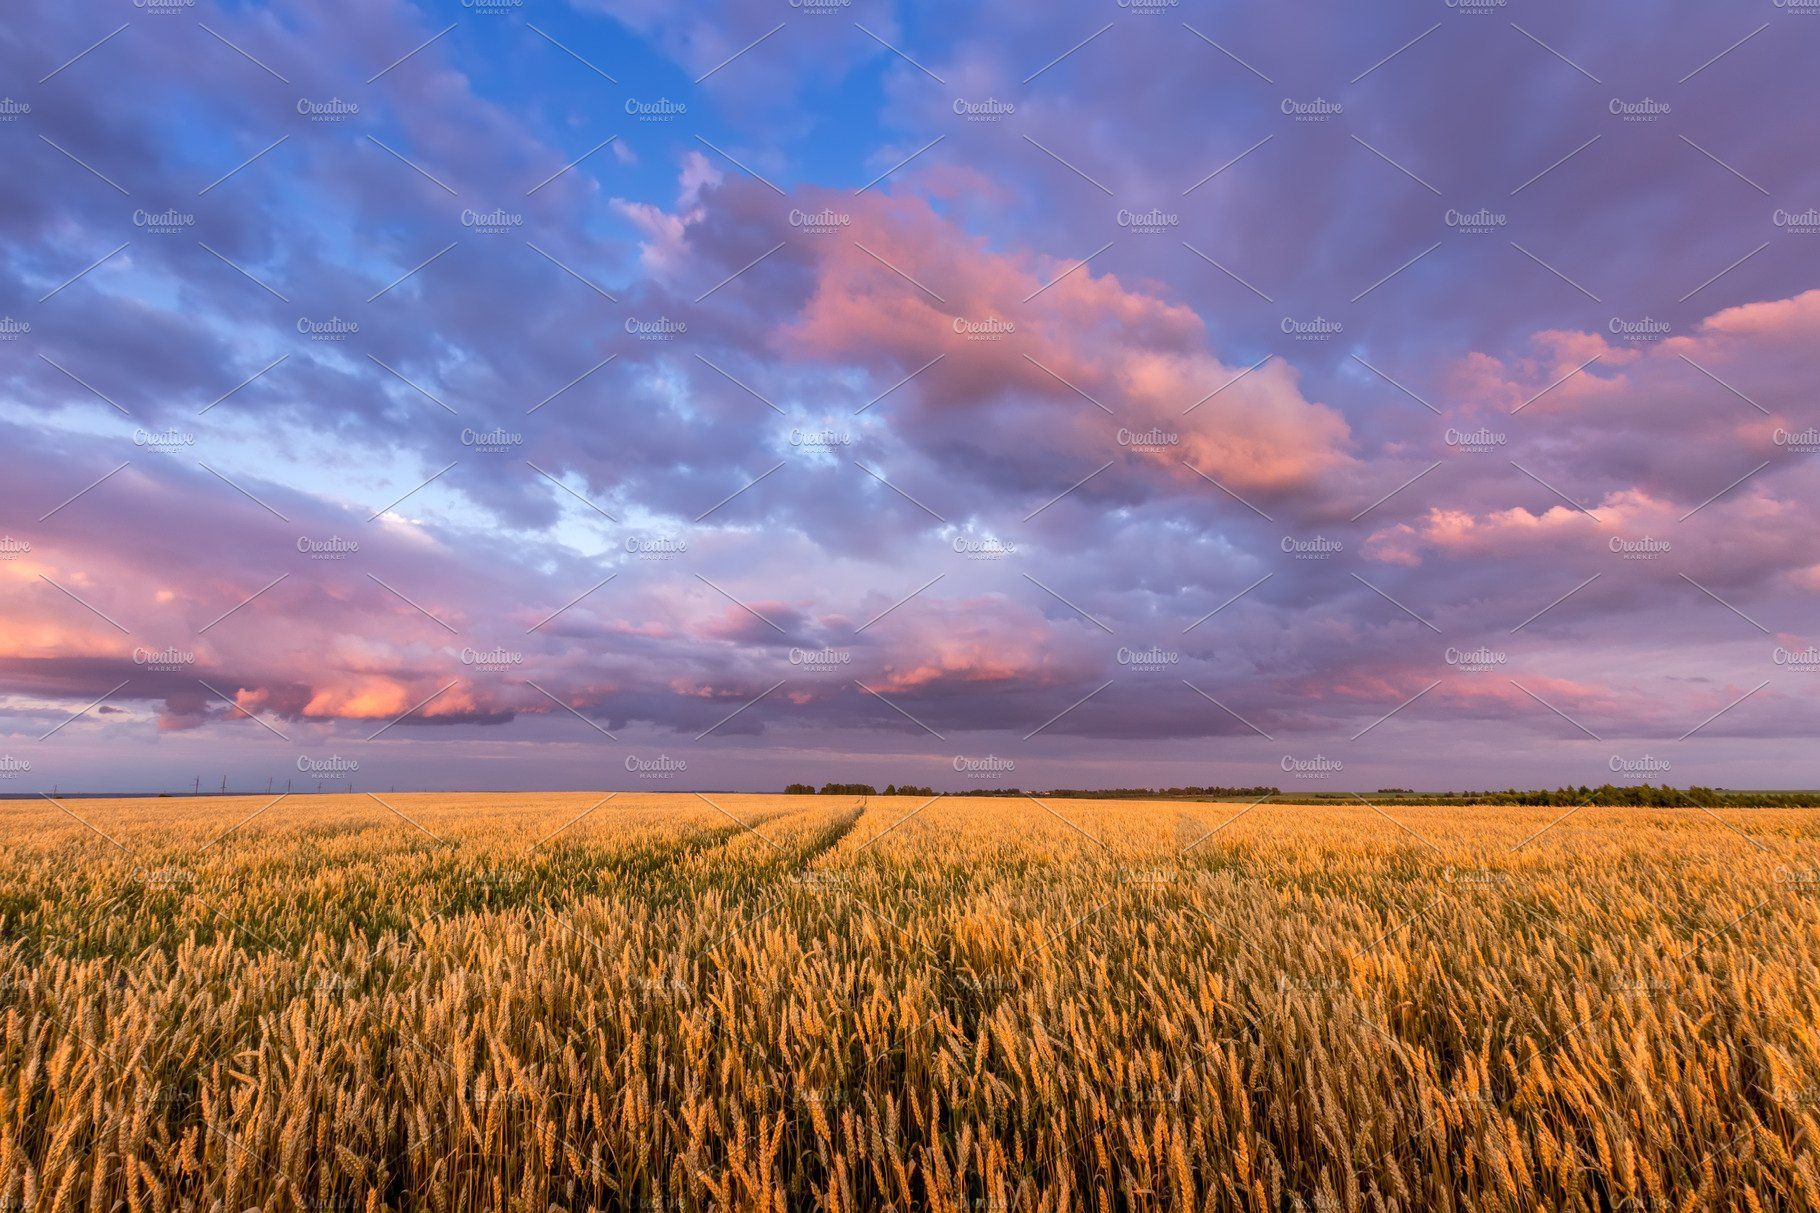 Twilight On A Wheat Field Sky Landscape Nature Photos Wheat Fields